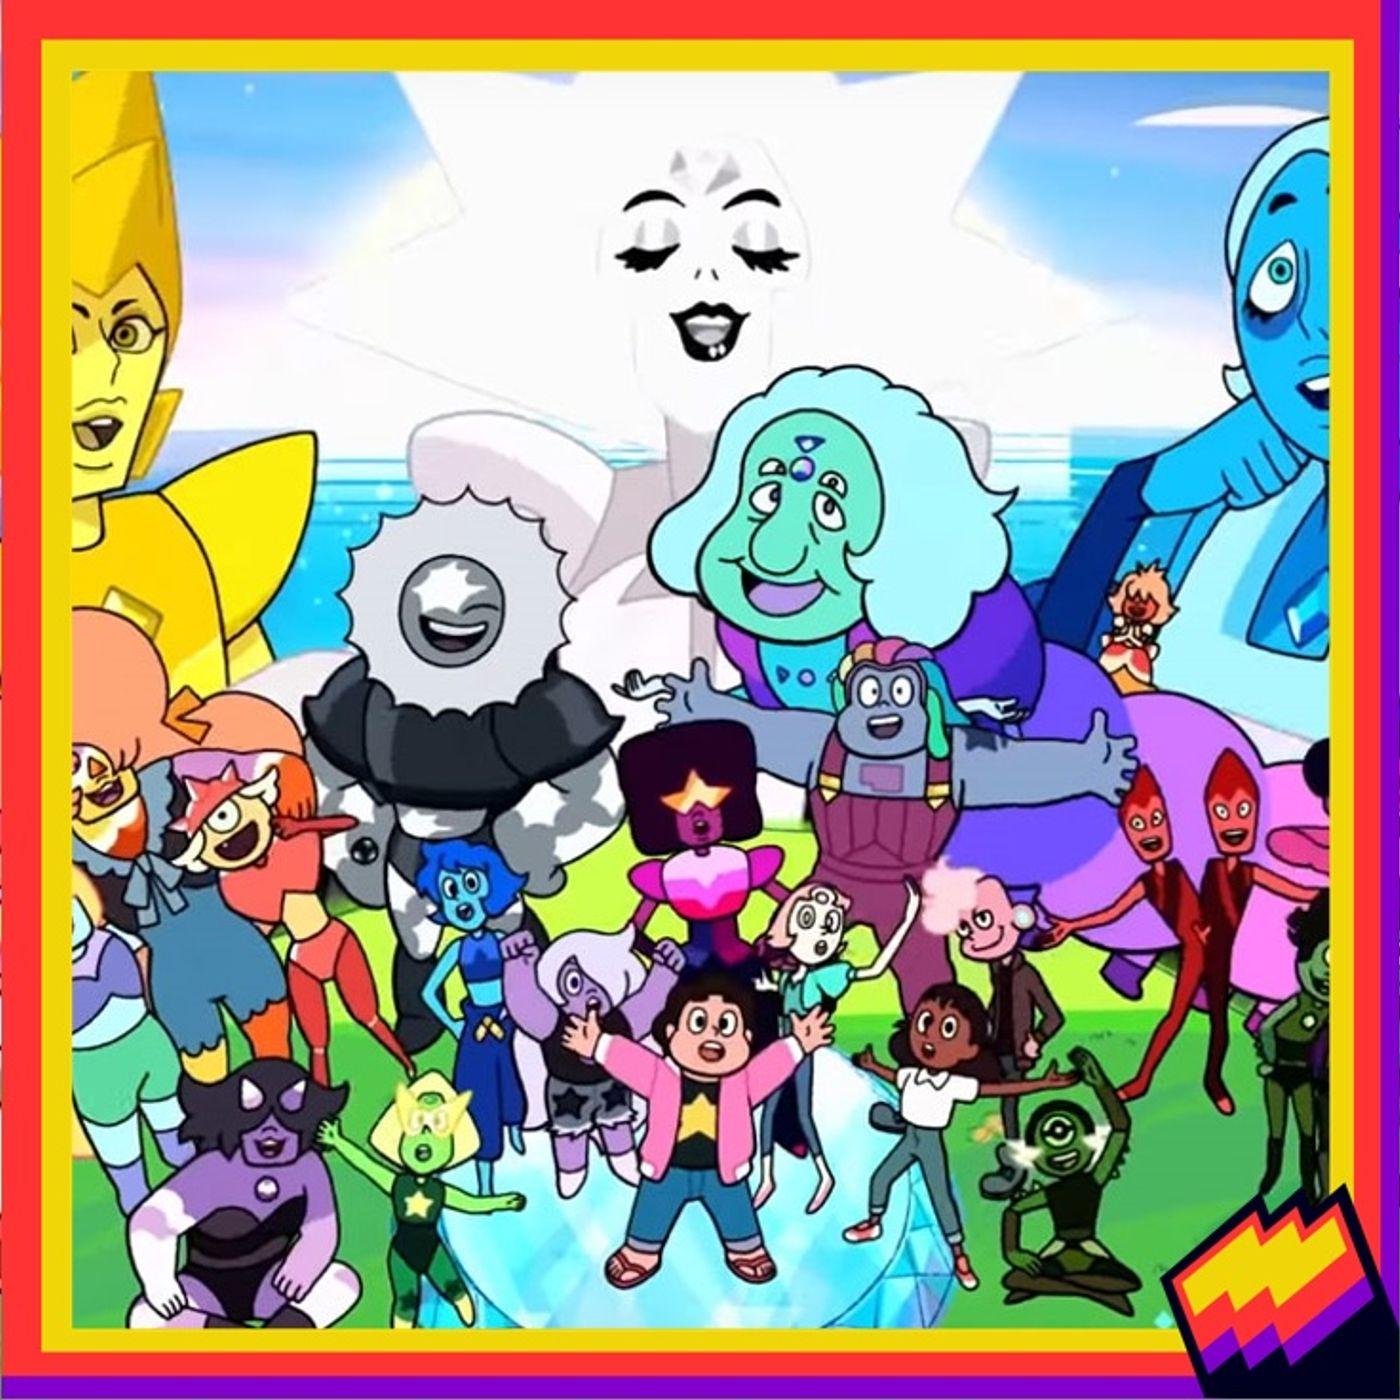 T09E08- Steven Universe Future: ¡Que vayan a terapia, carajo!